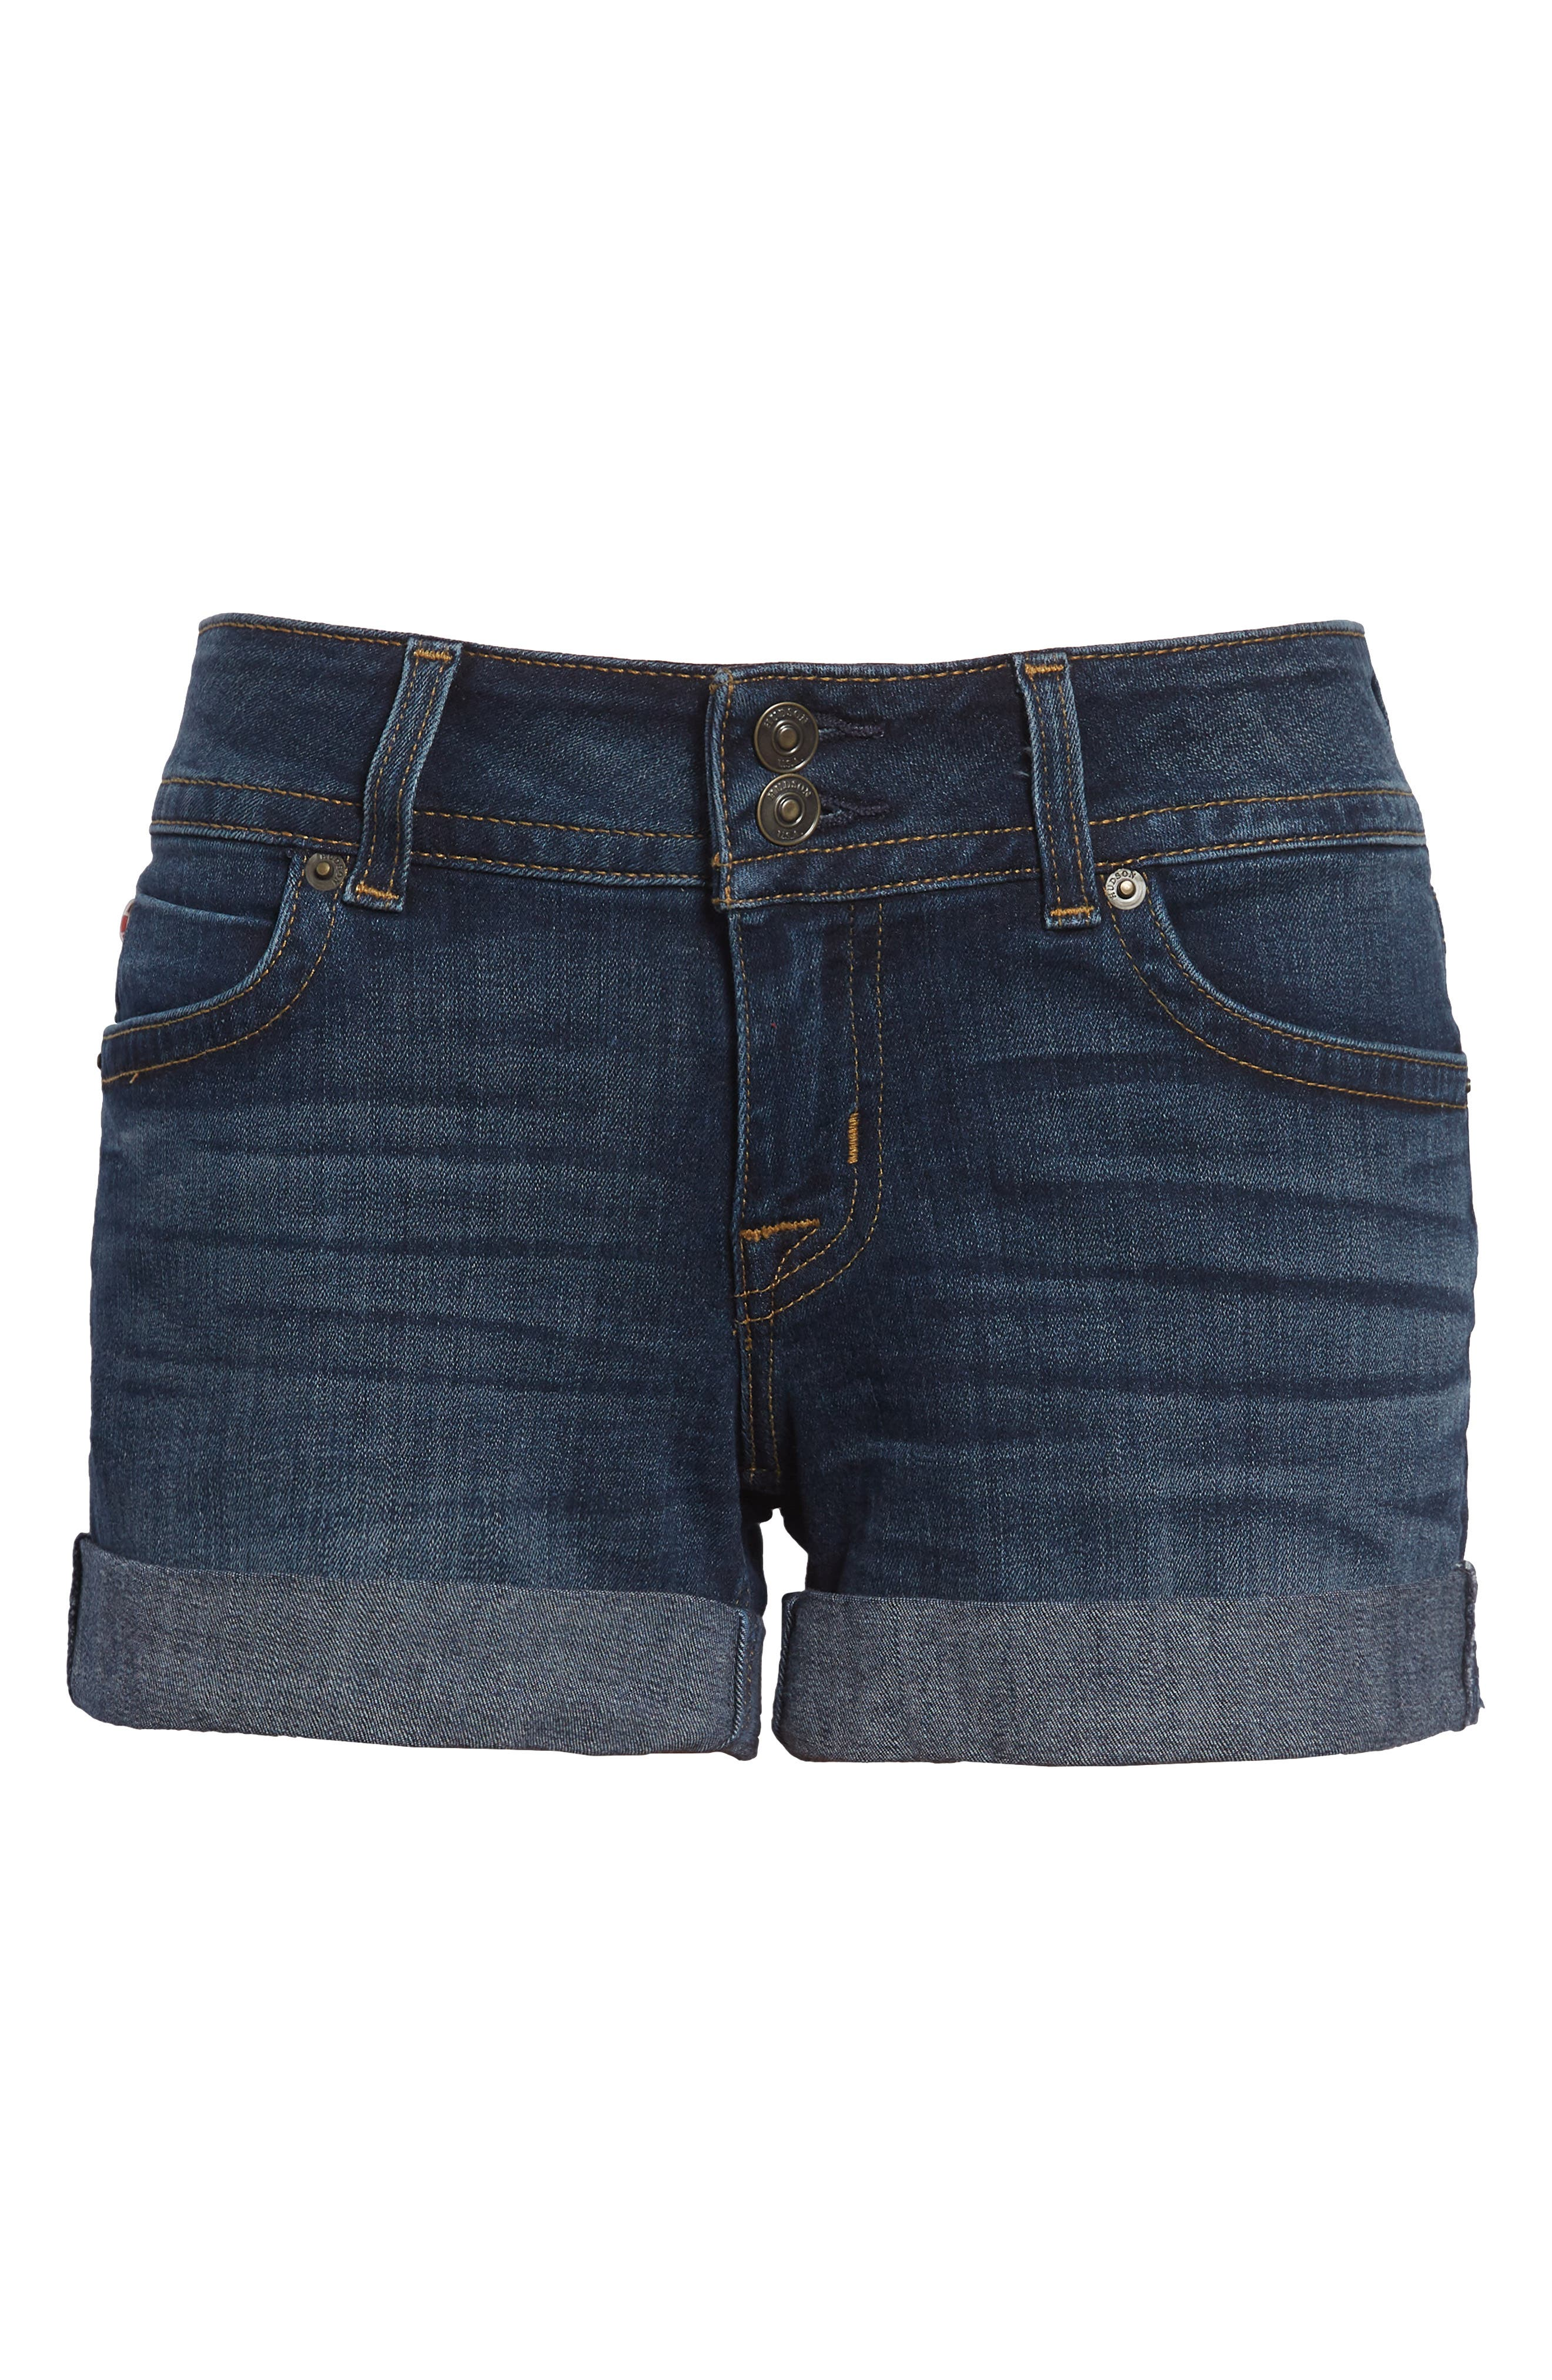 'Croxley' Cuffed Denim Shorts,                         Main,                         color, 400